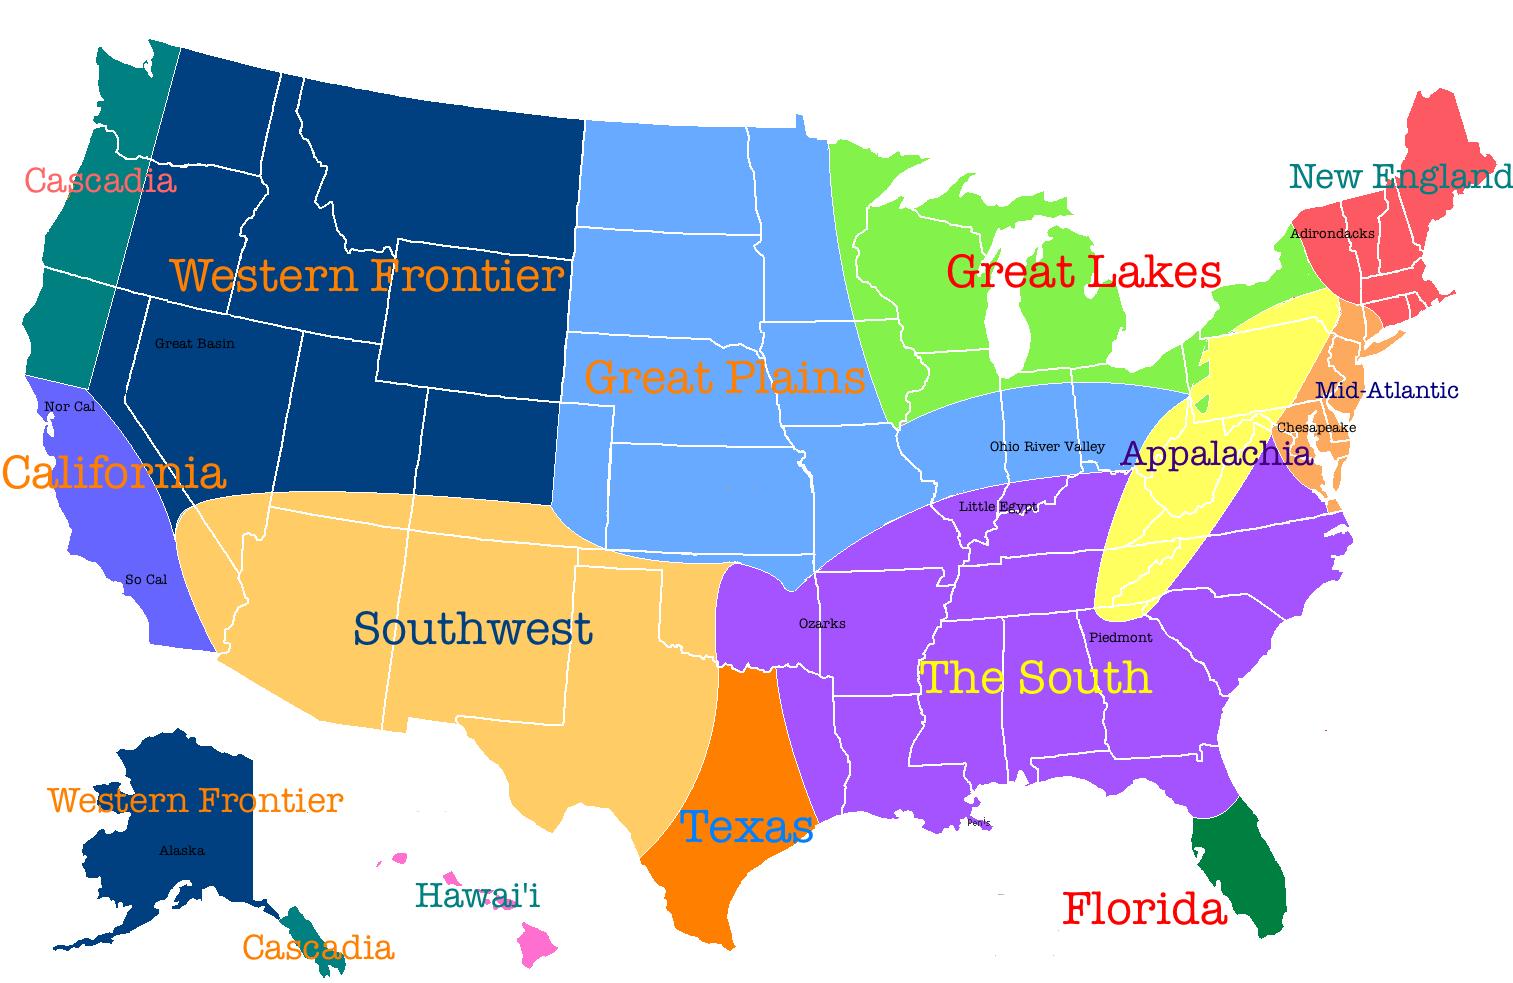 Great Lakes On The Us Map Globalinterco - Us regions map ohio dayton